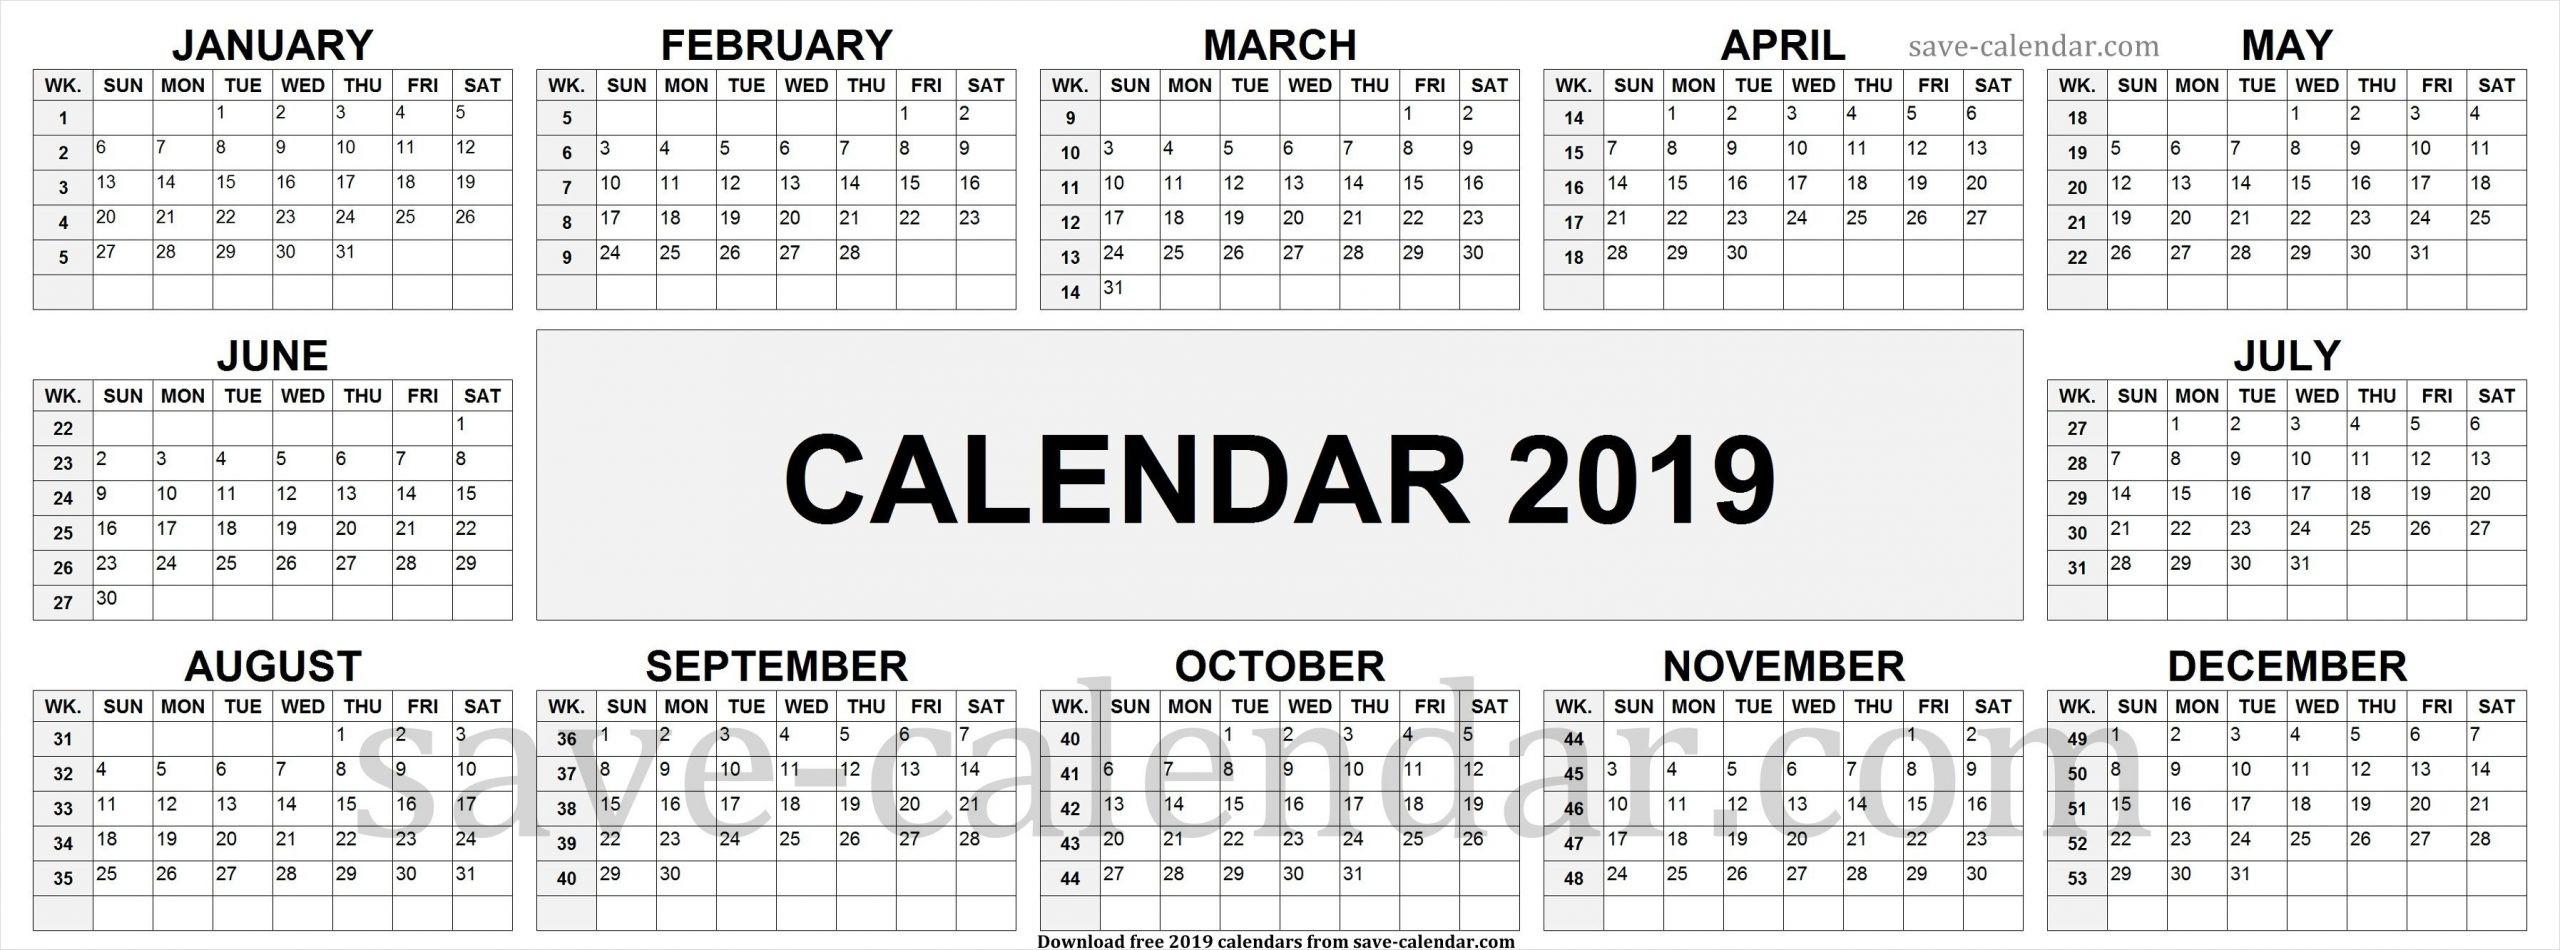 Depo Schedule For 2021 | Calendar Printables Free Blank  Depo-Provera Perpetual Calendar Pdf